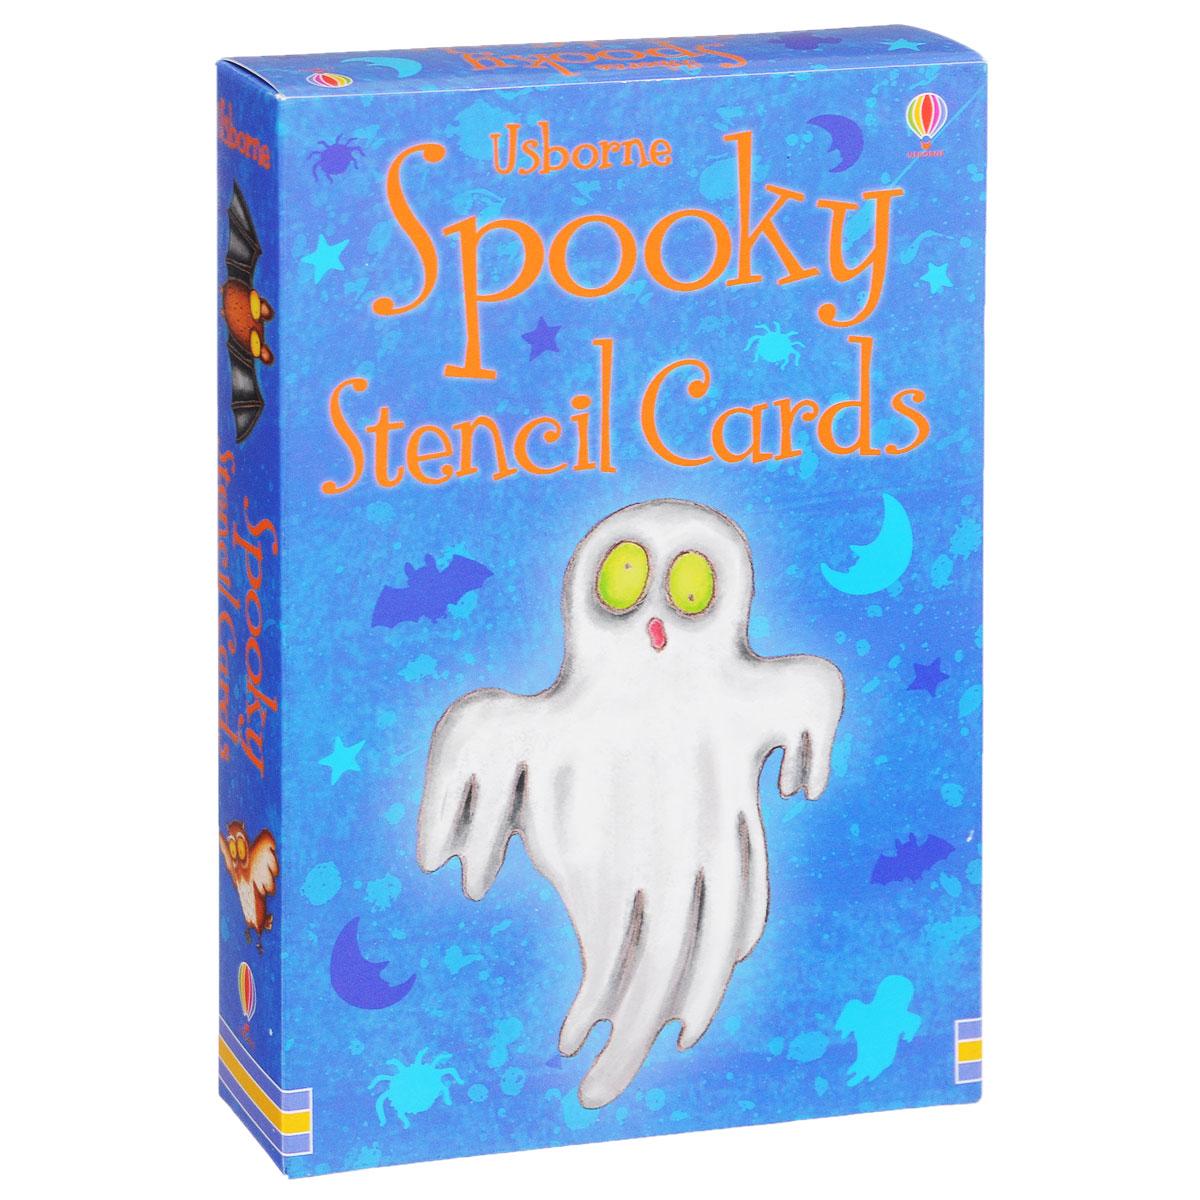 Spooky Stencil Cards (набор из 16 карточек)